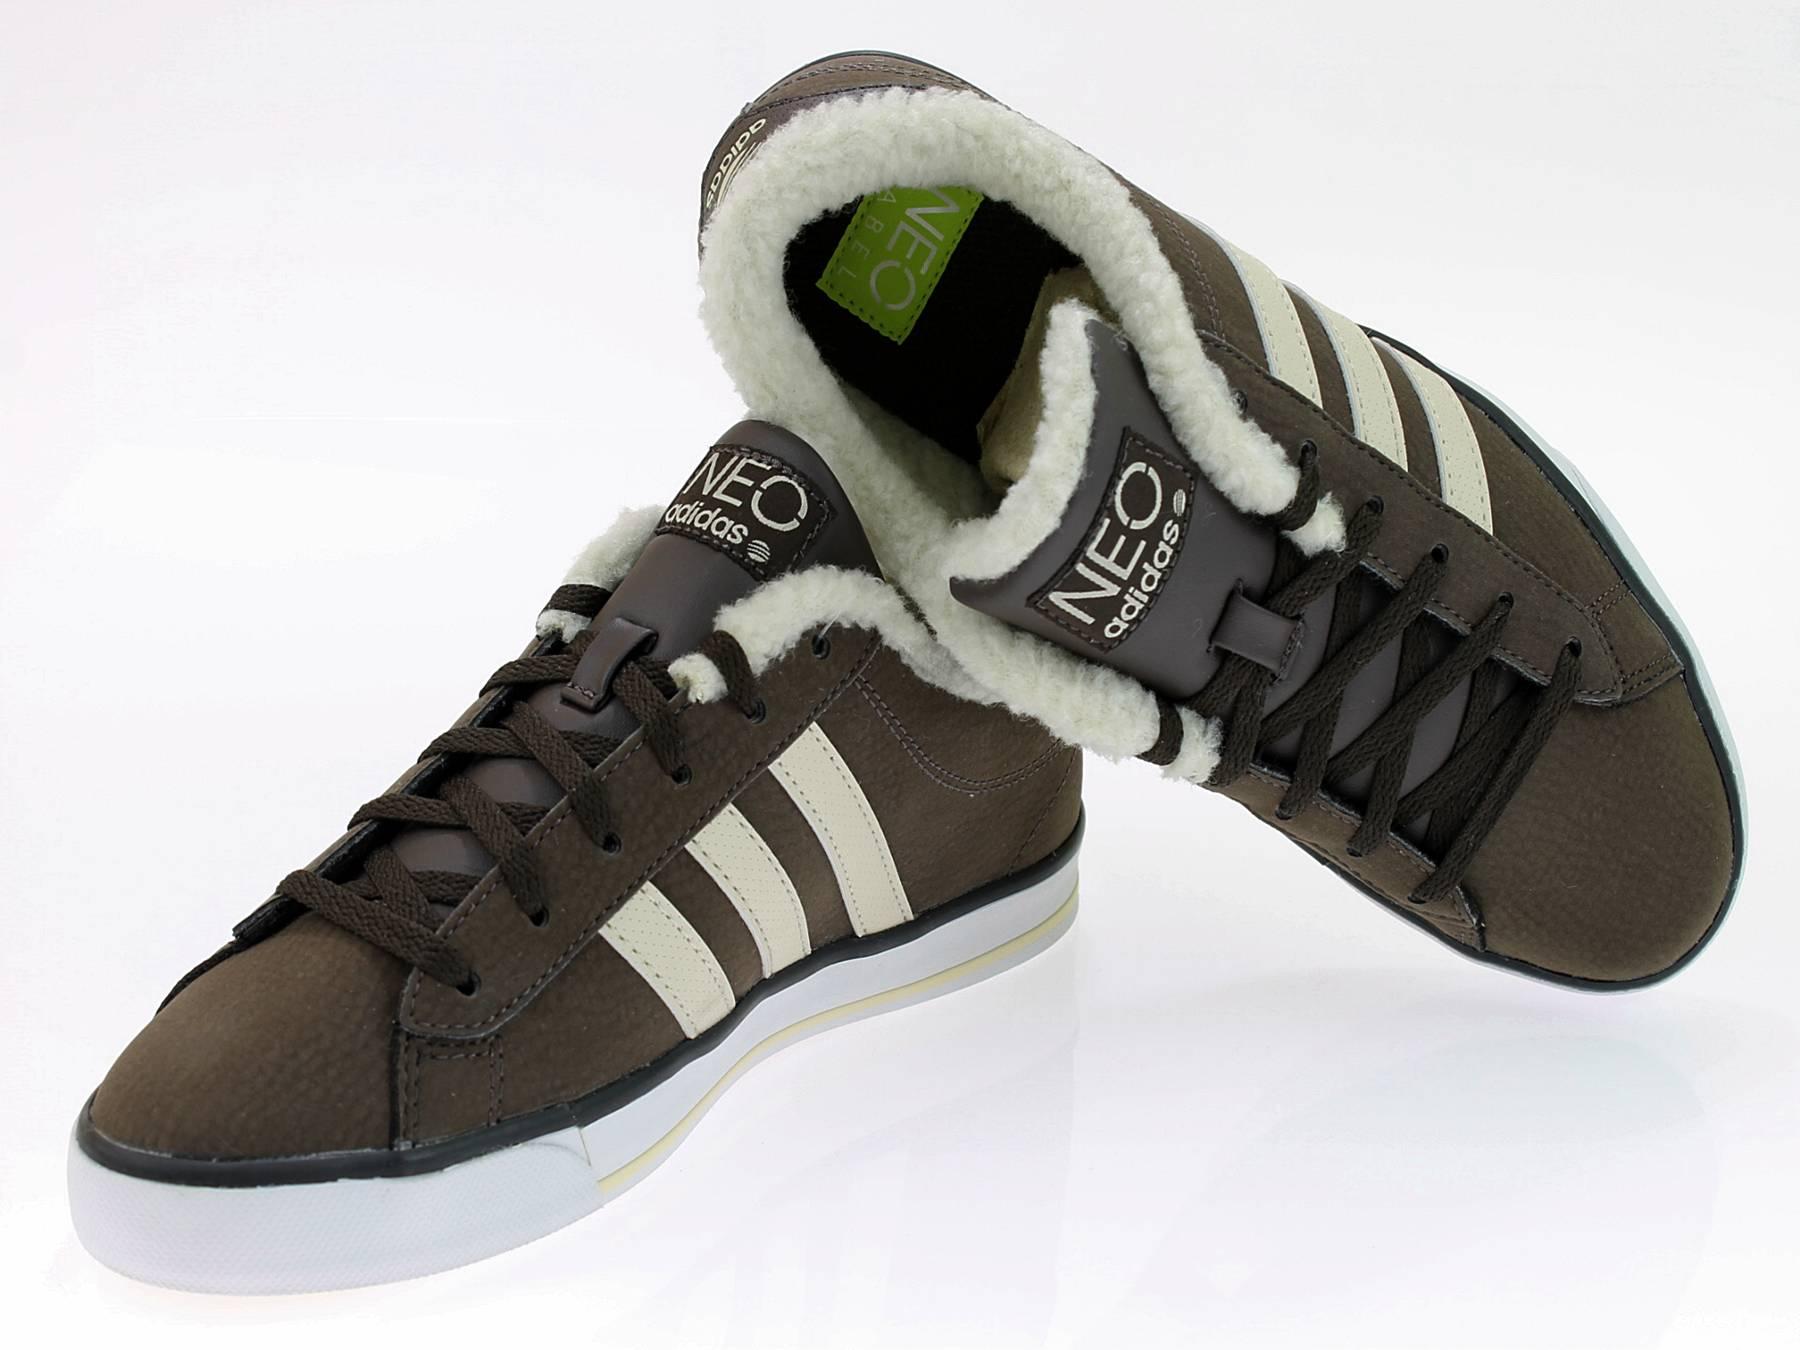 detailed look c63bc de330 BUTY sportowe adidas Daily G52016 futerko r 39,5 (6779436326)